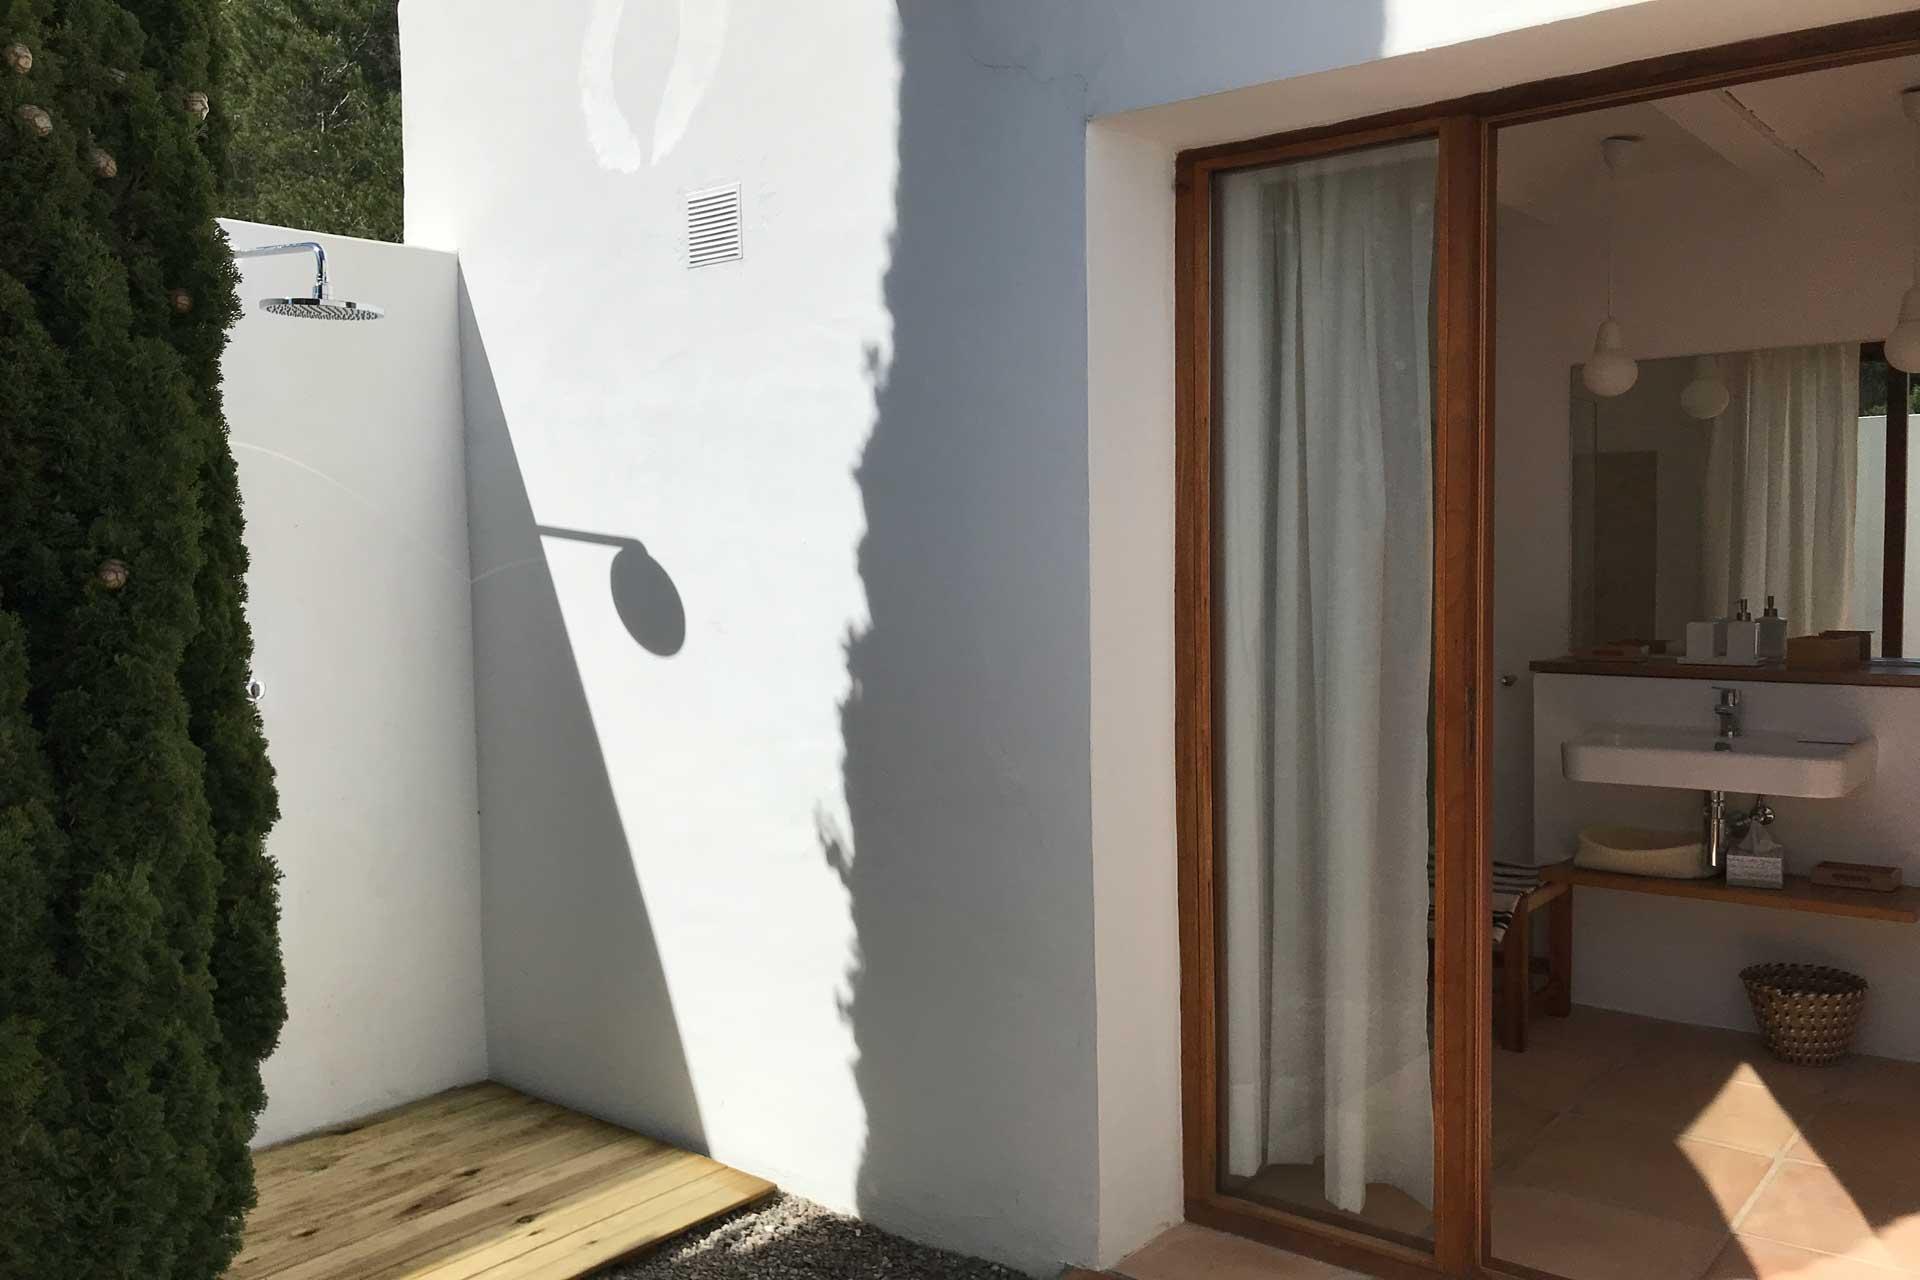 Villa Poeta - Bathroom 2 with courtyard